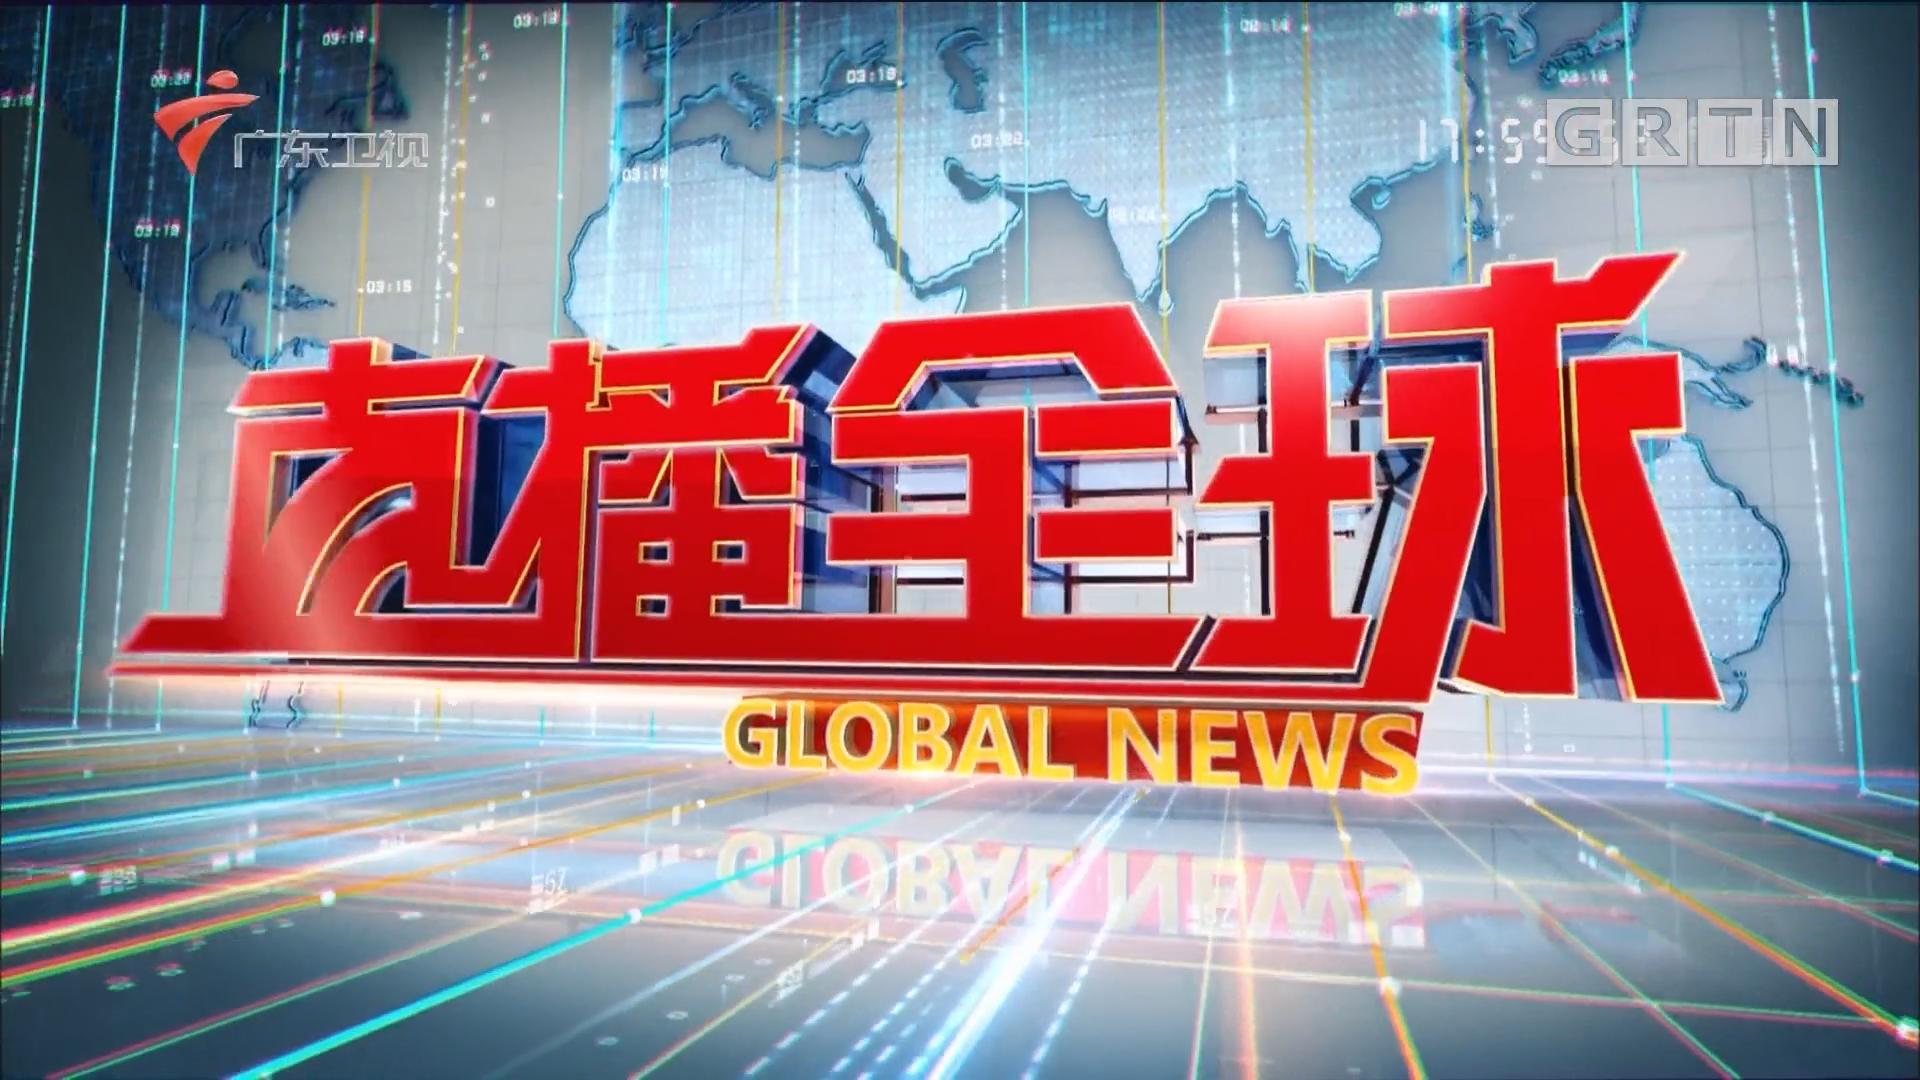 [HD][2018-02-12]直播全球:朝鲜高级别代表团结束访韩返朝:金与正和文在寅亲密交谈